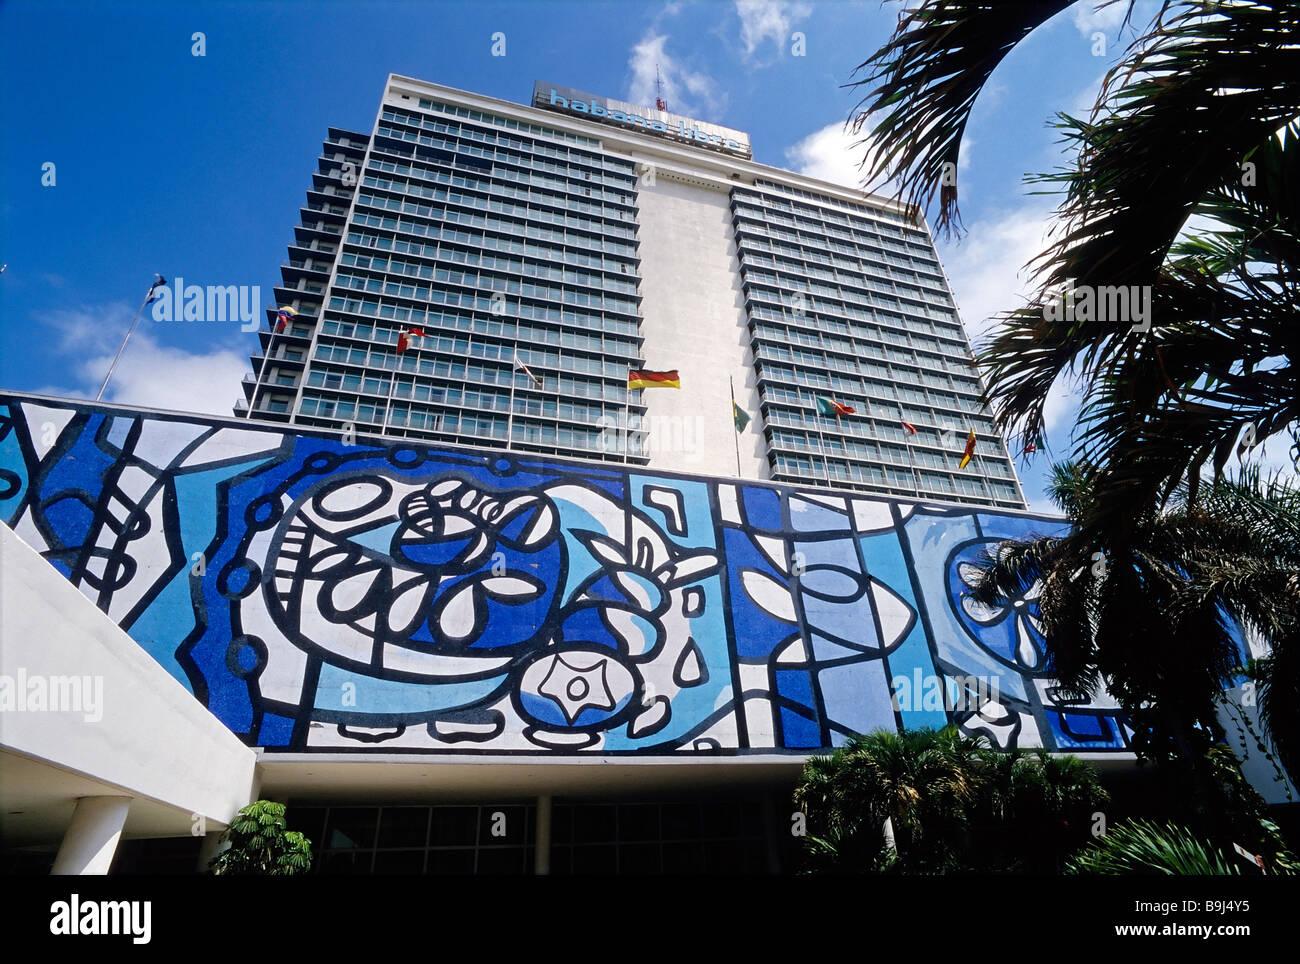 Habana Libre Hotel, tile painting by Amelia Pelaez, Vedado, Havana, Cuba, Caribbean - Stock Image